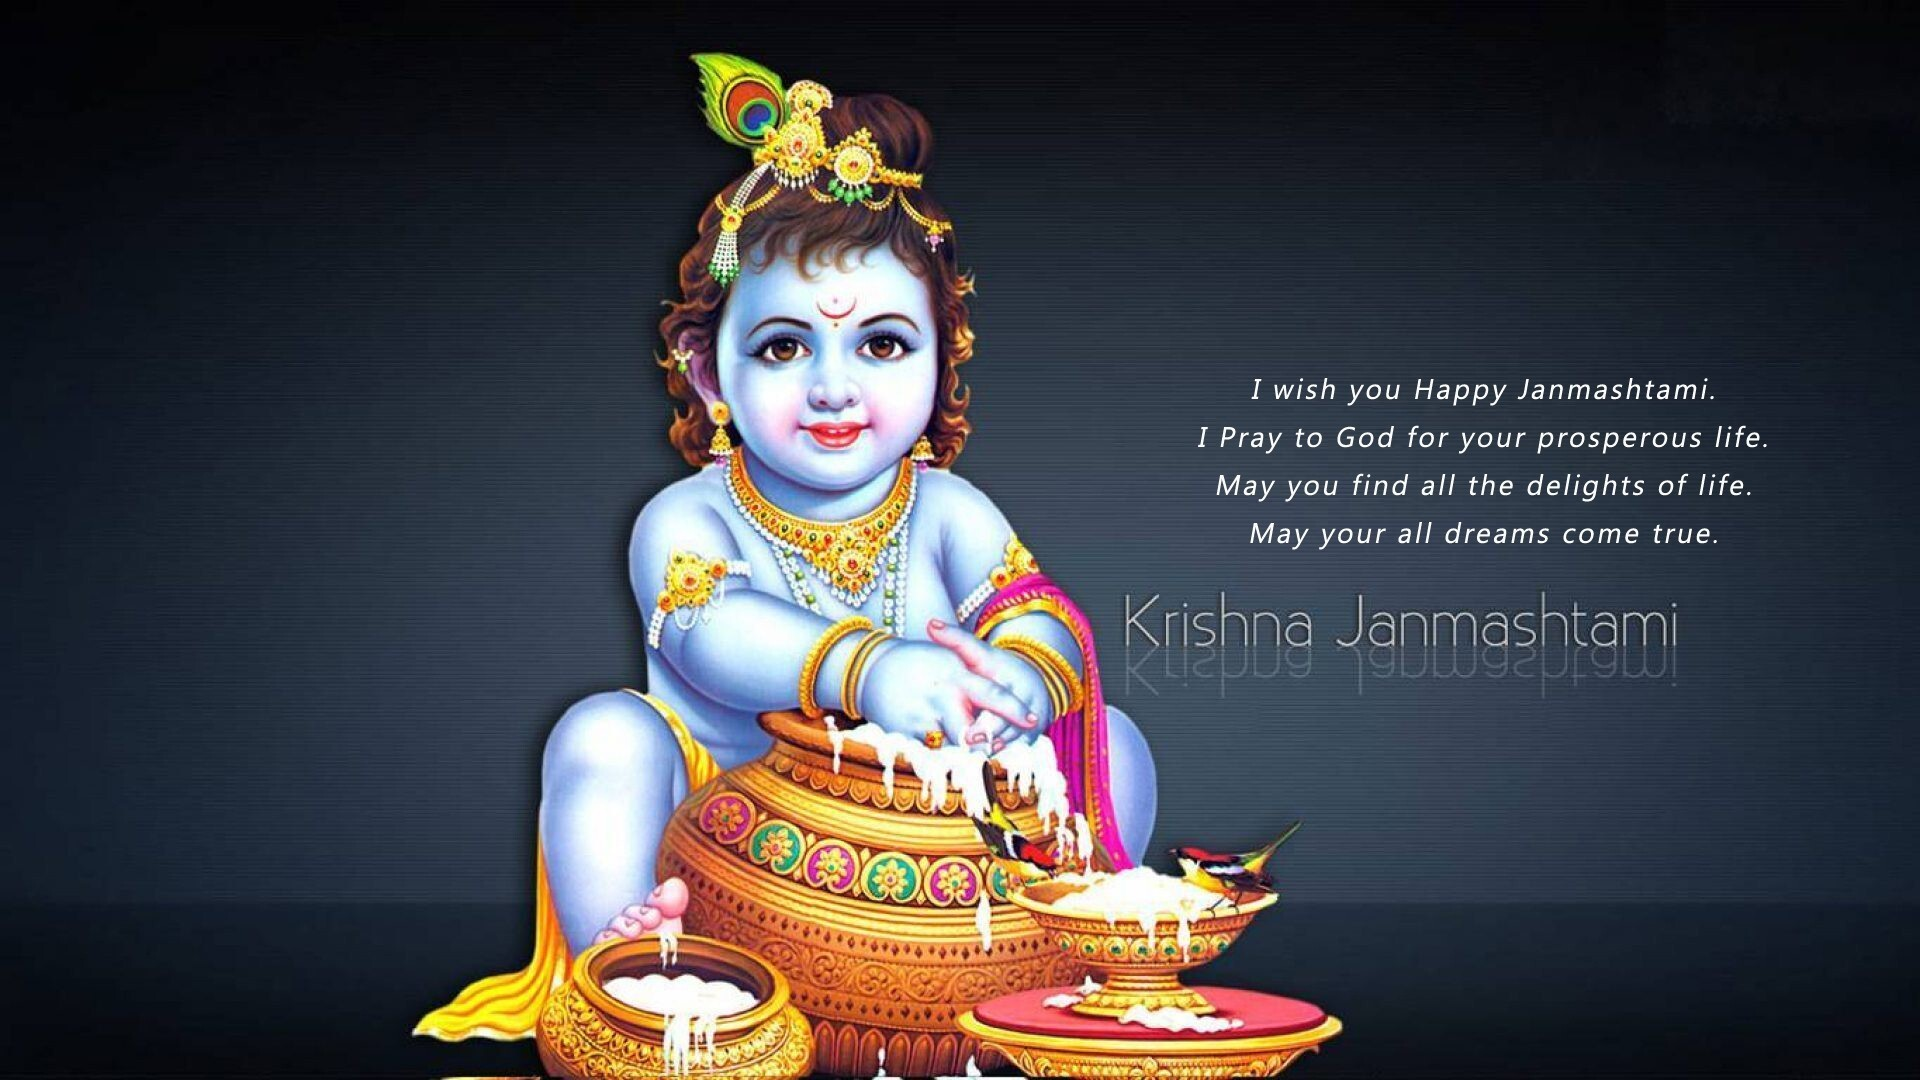 lord krishna happy janmashtami greetings message wallpaper hd